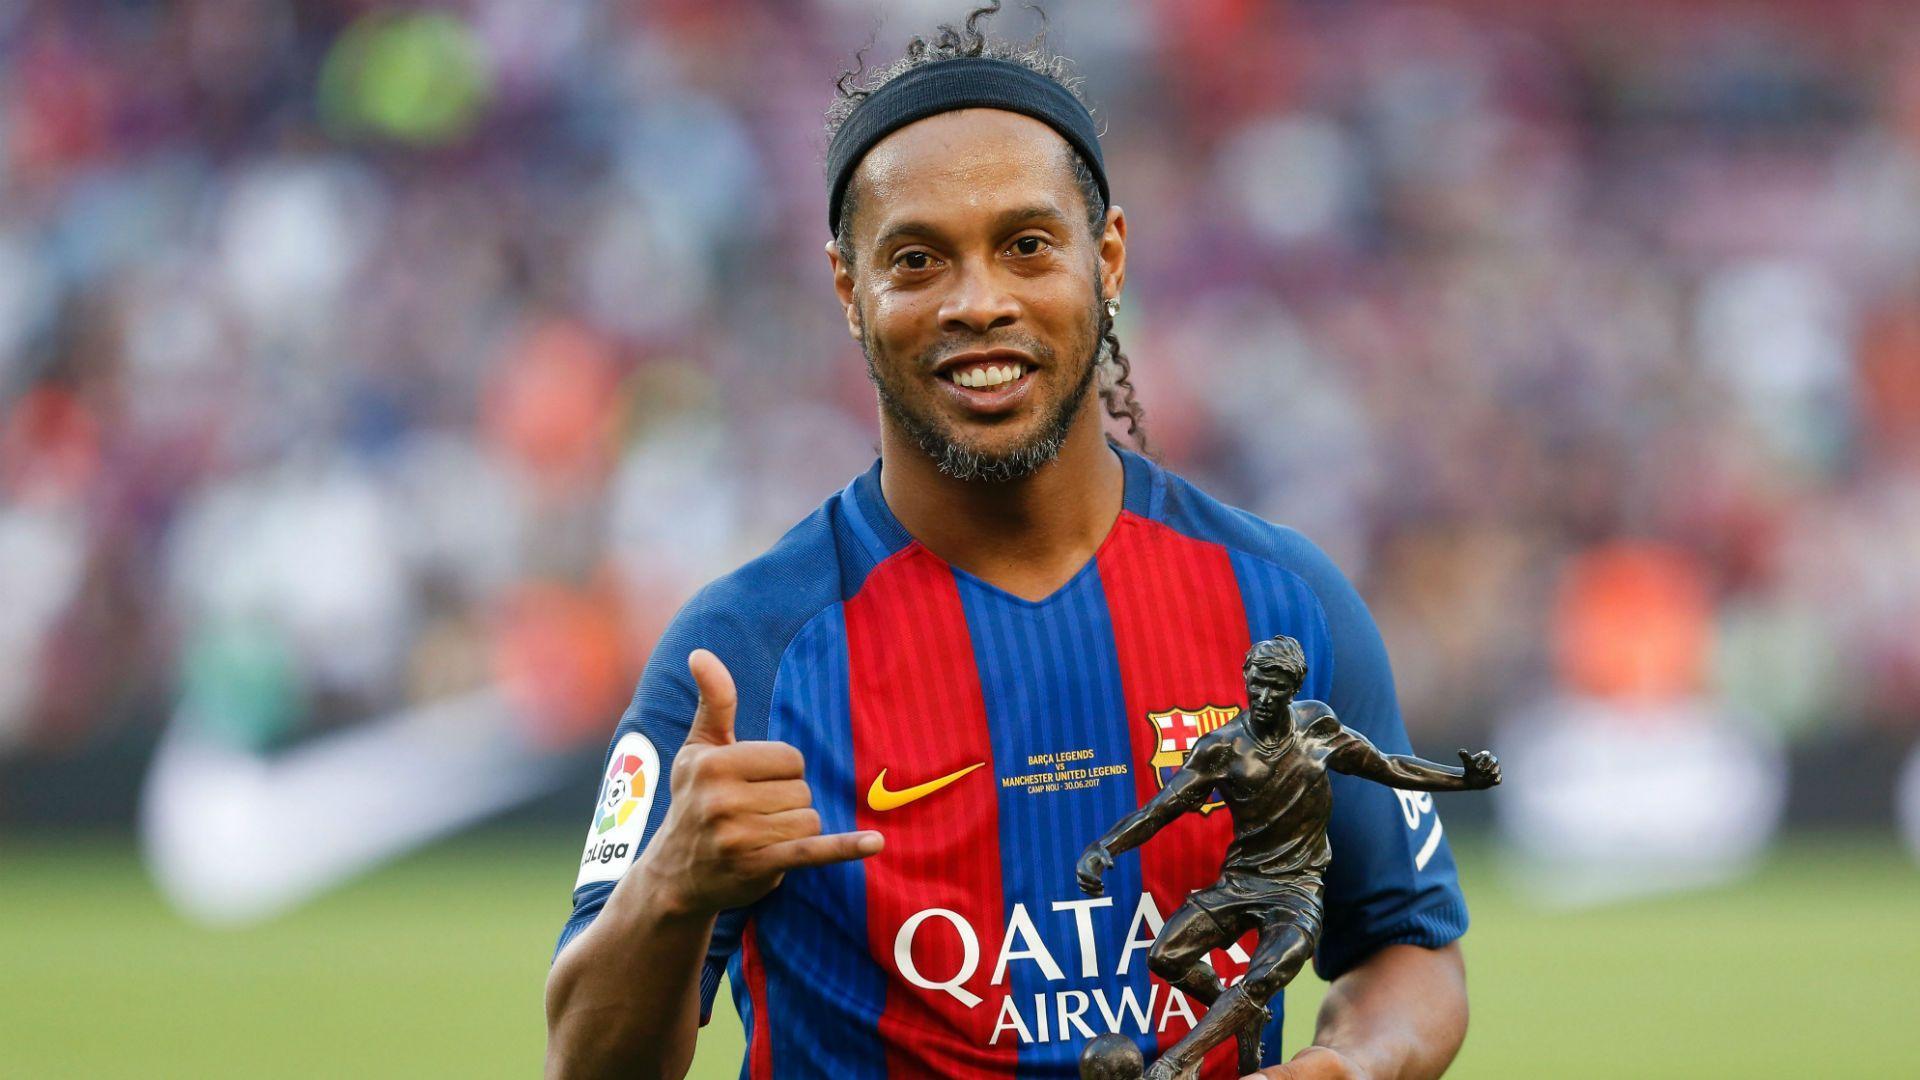 Ronaldinho 2018 wallpapers wallpaper cave - Ronaldinho wallpaper ...